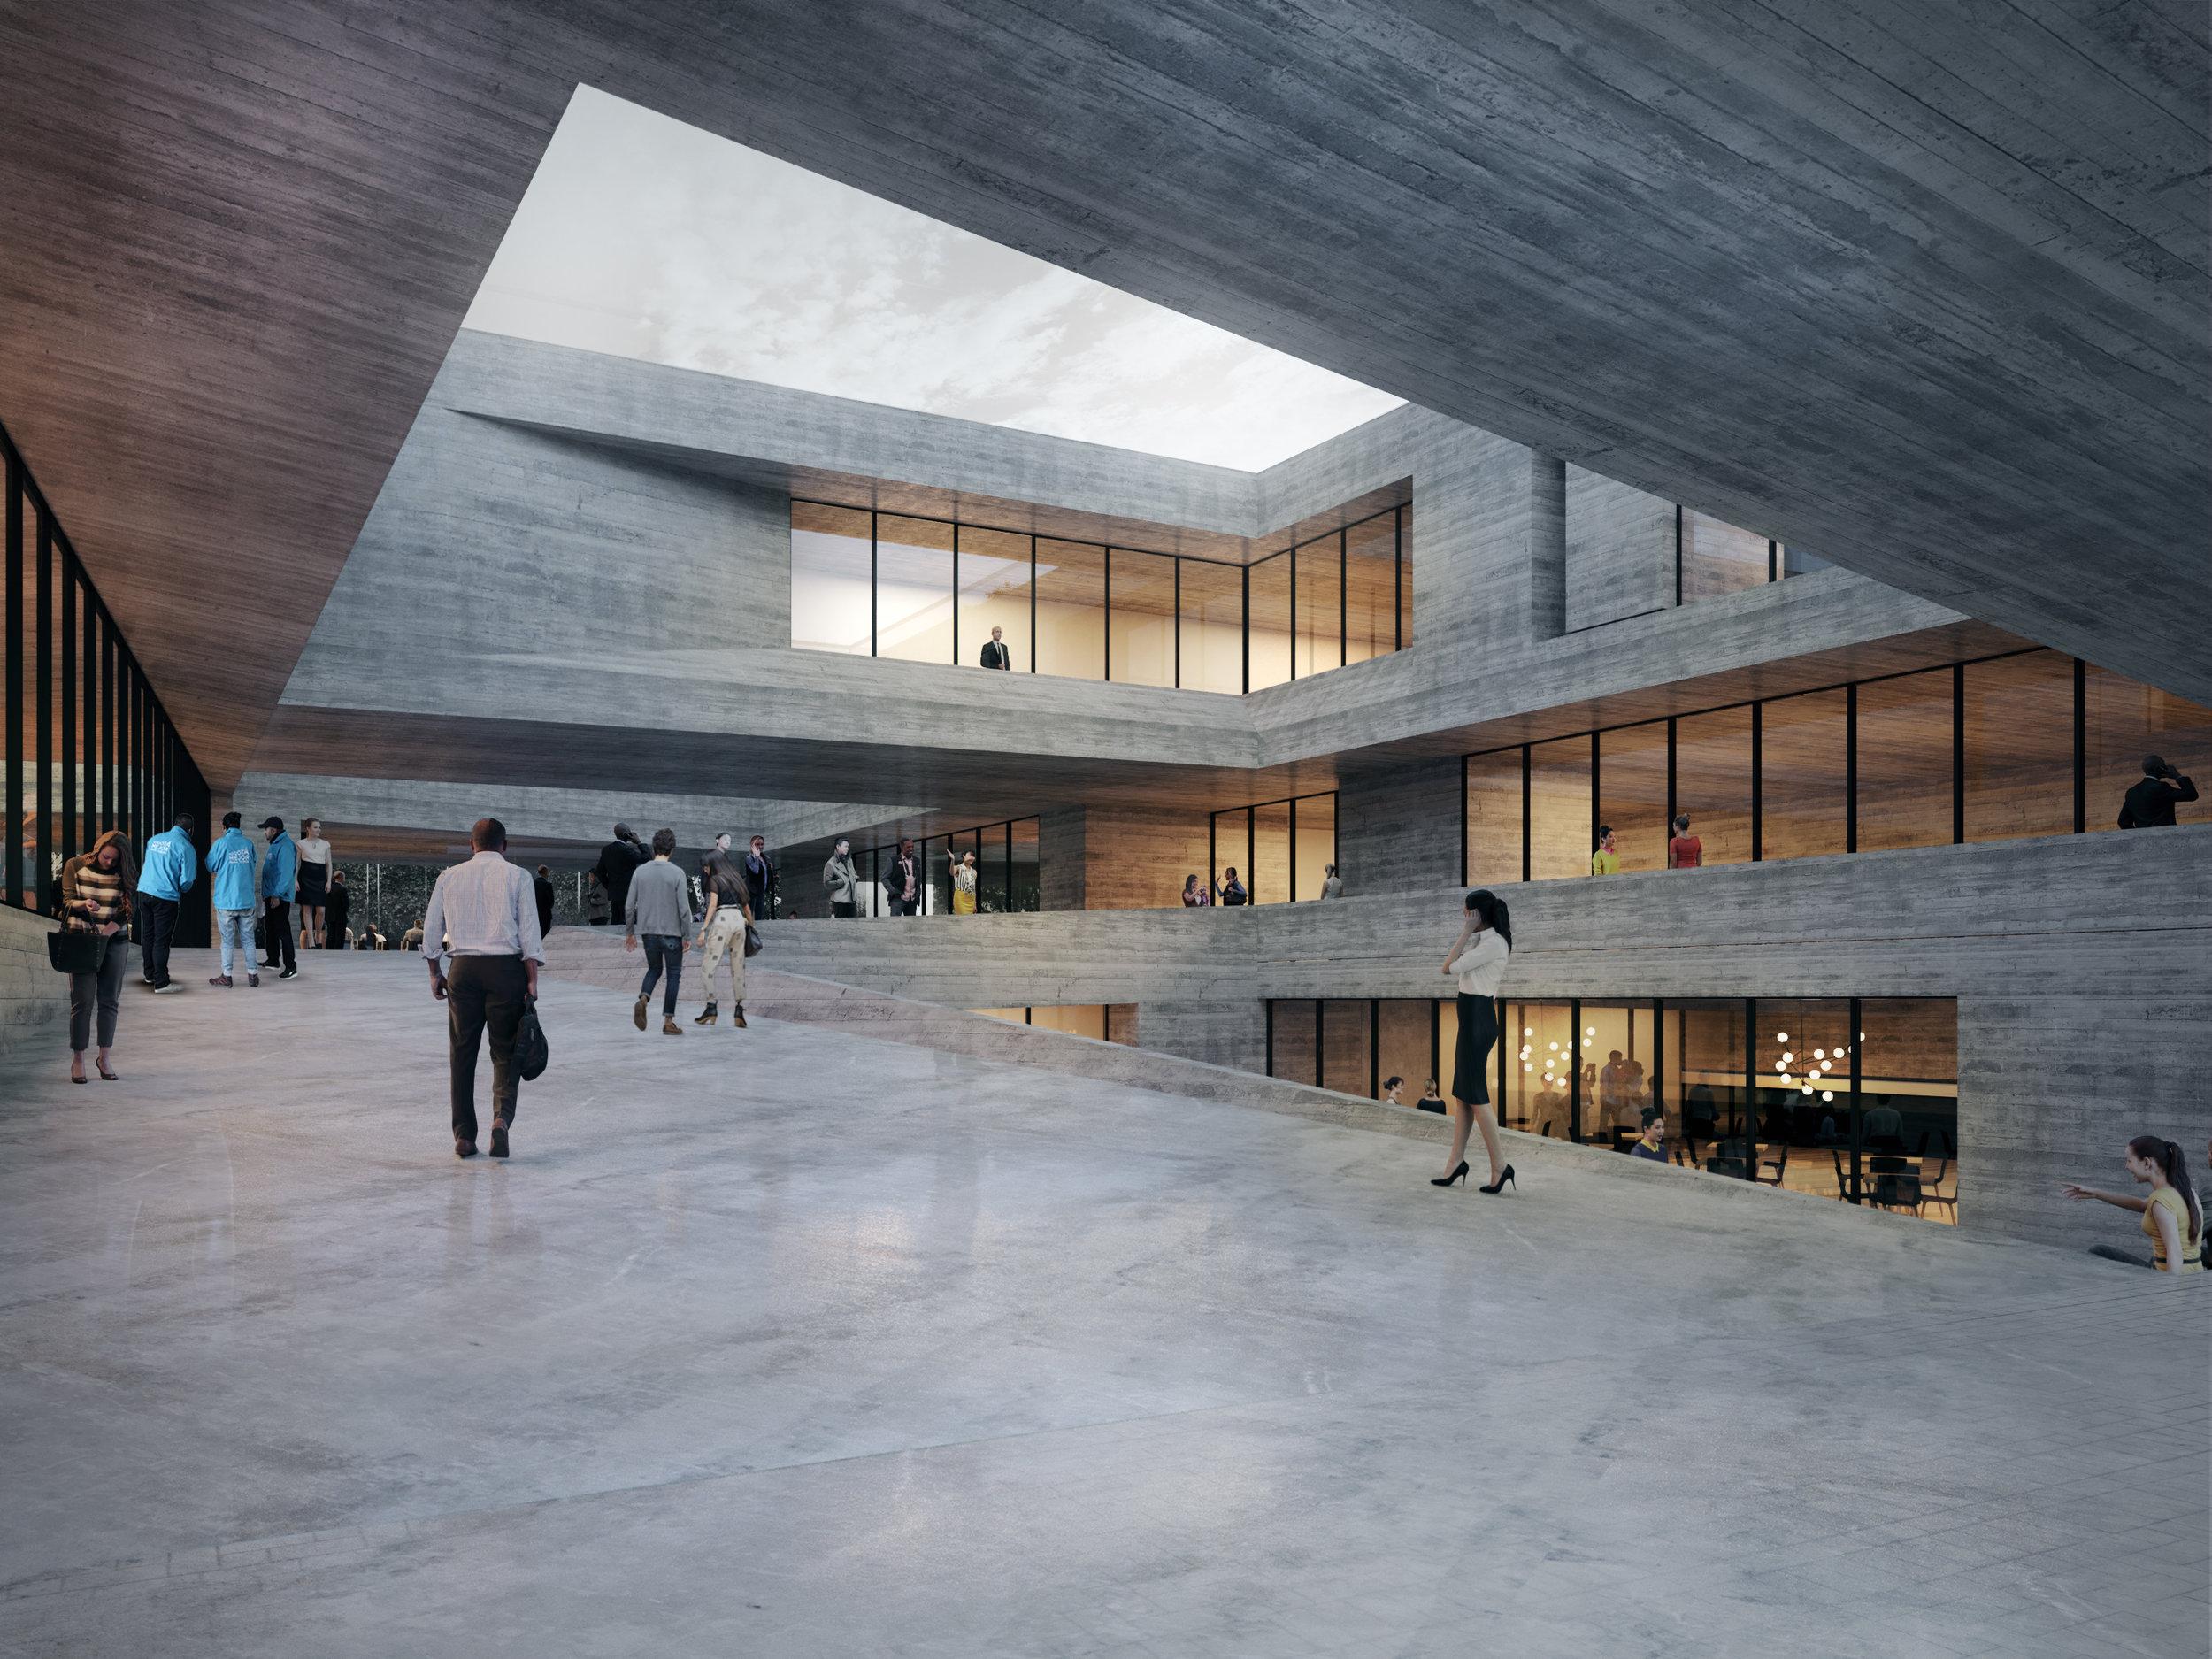 Architect: Pablo Zarama & Lorenzo Pombo